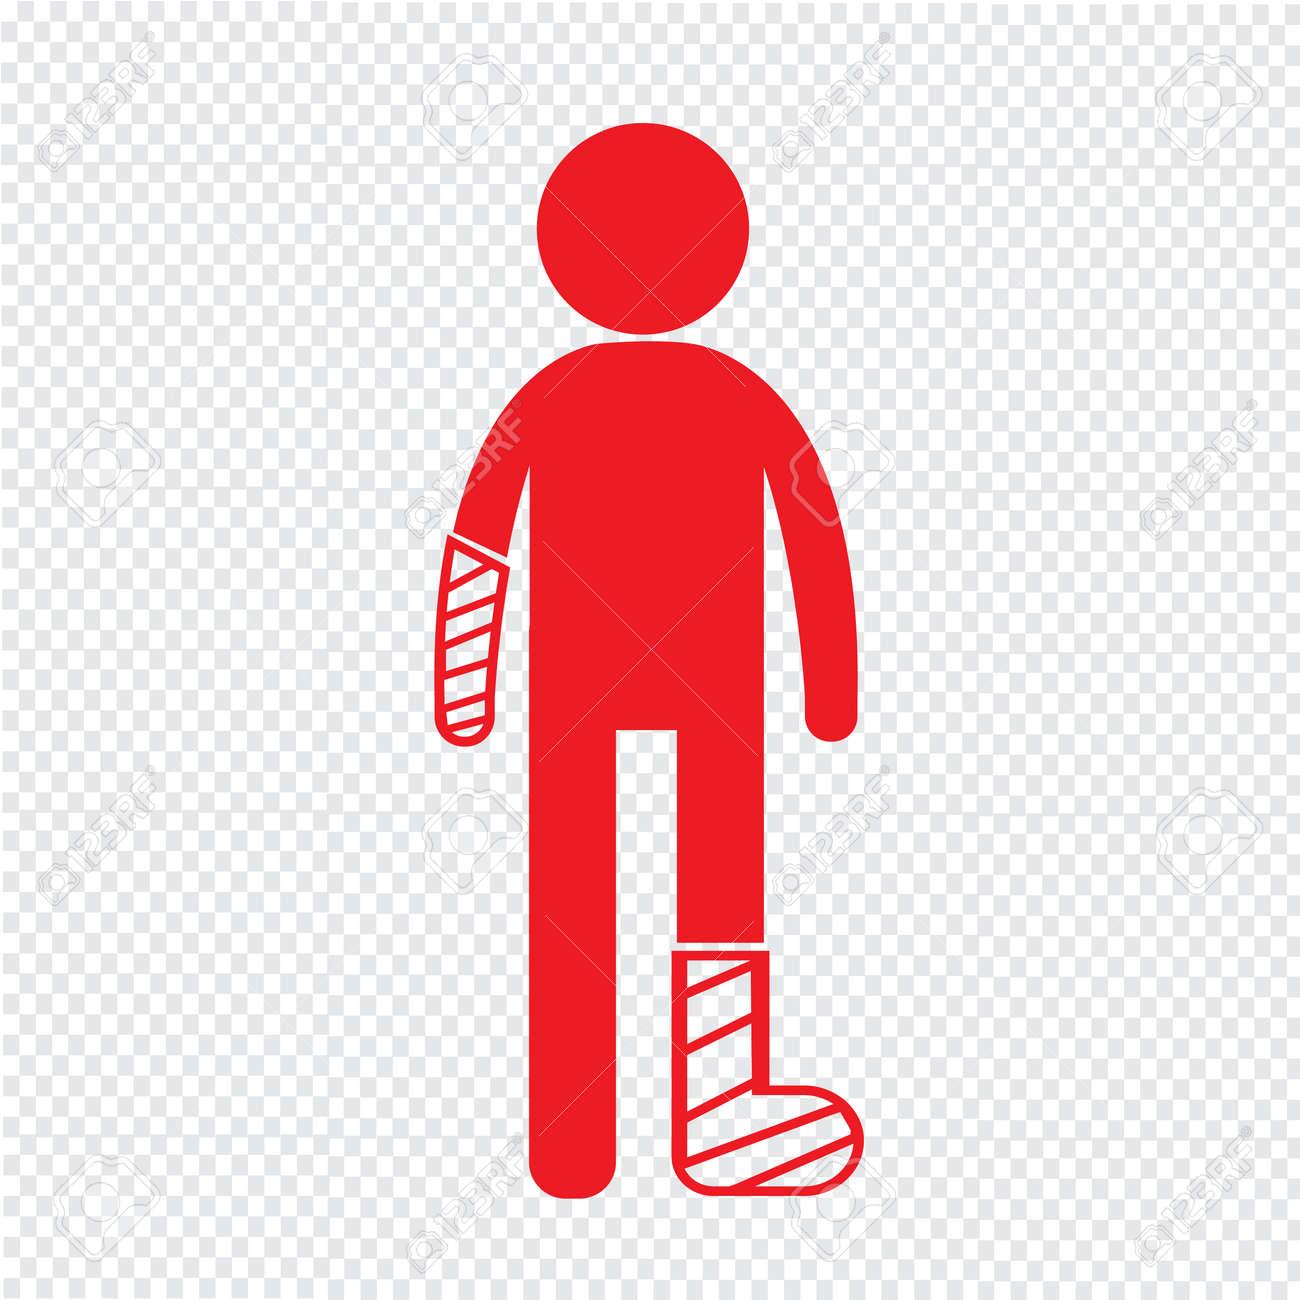 People Broken Arm and Leg Icon Illustration design - 52808679